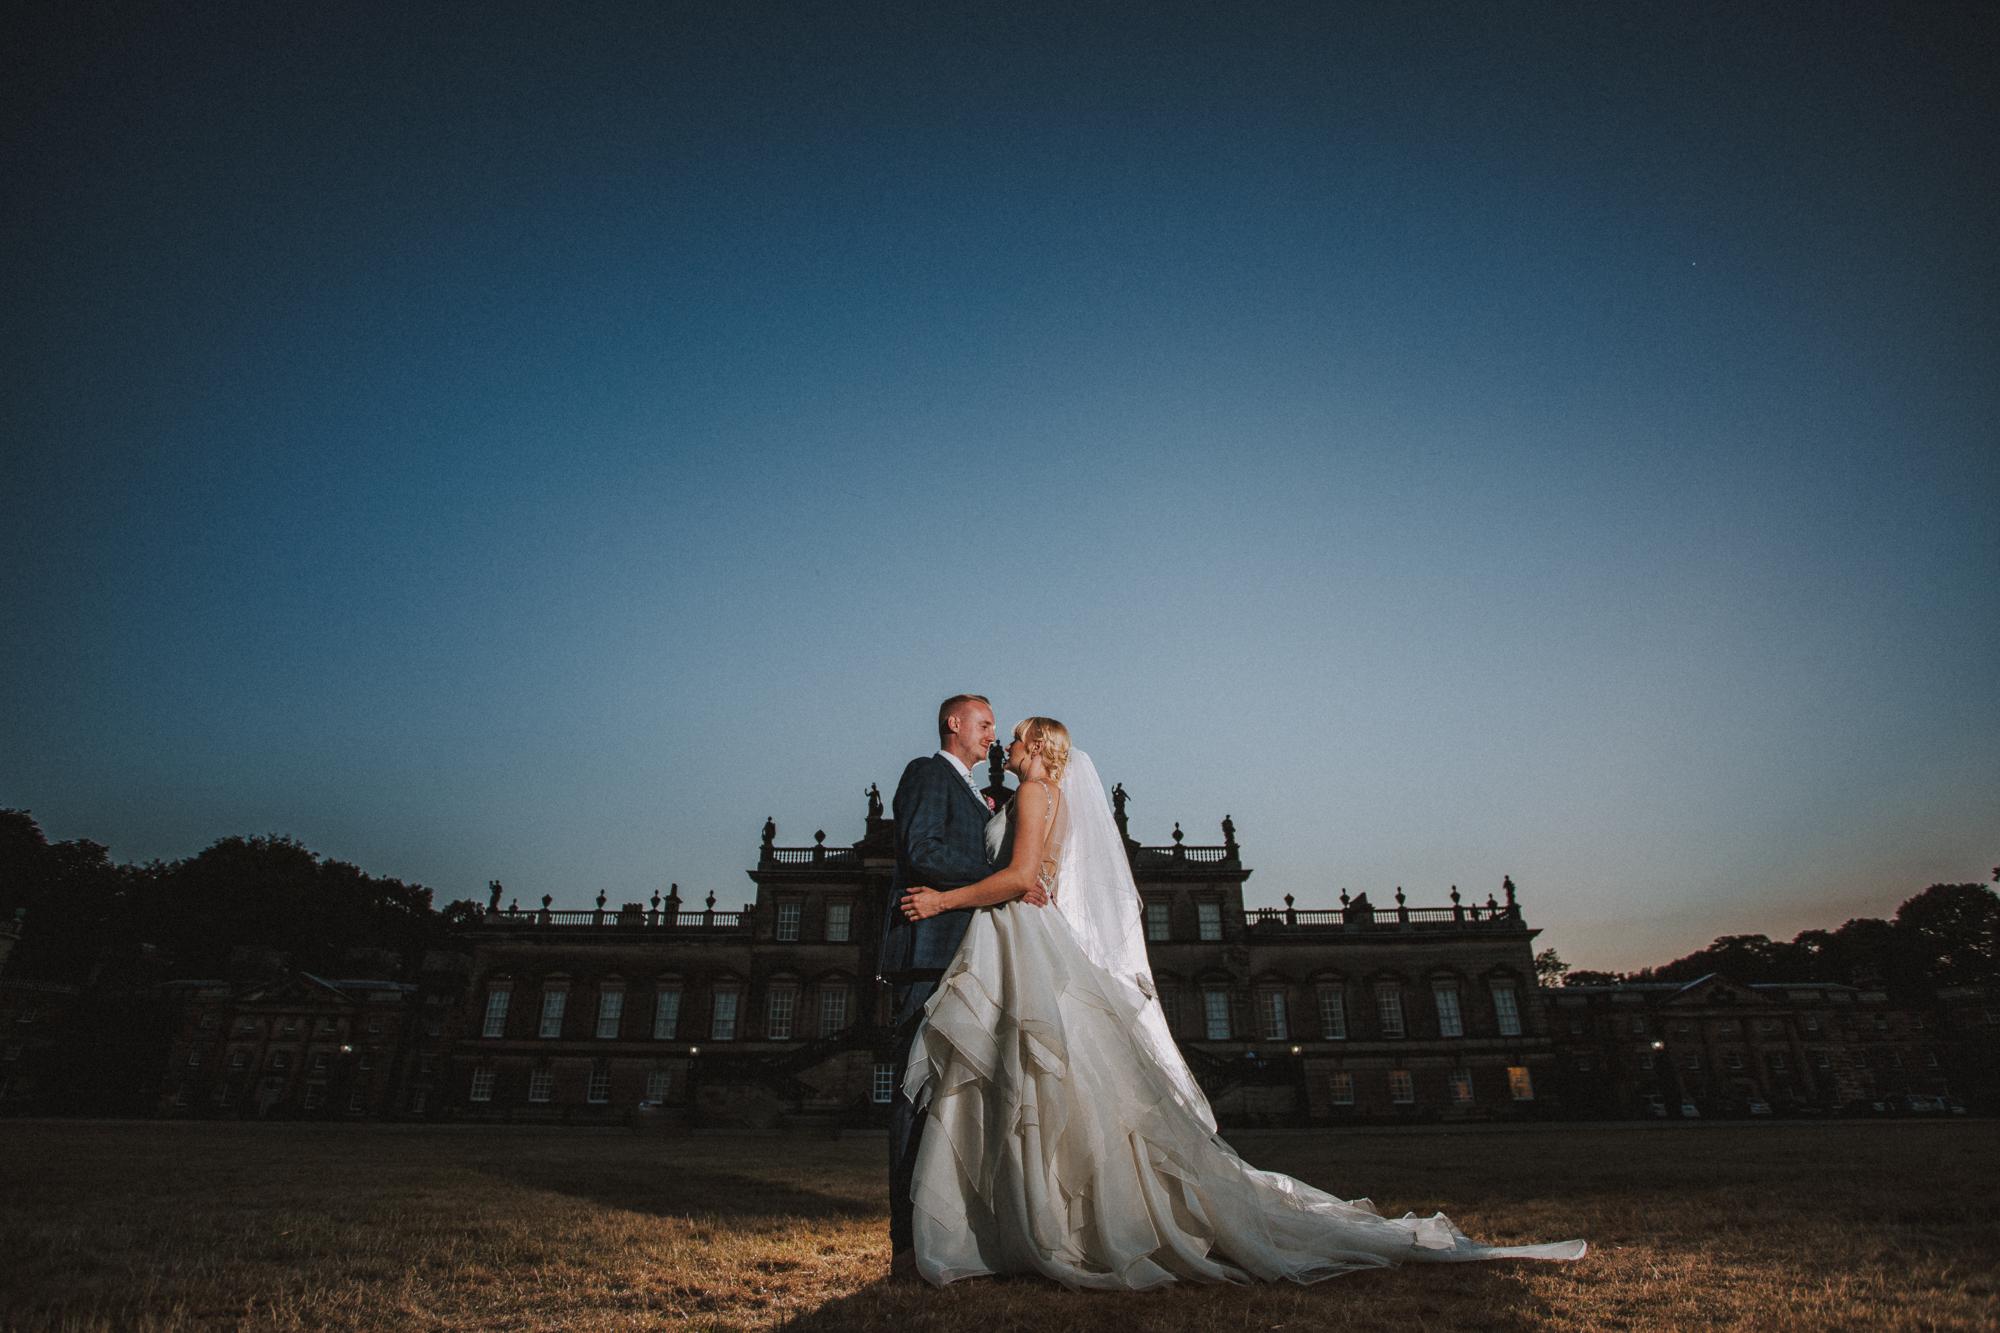 wentworth woodhouse weddings photographer-75.jpg